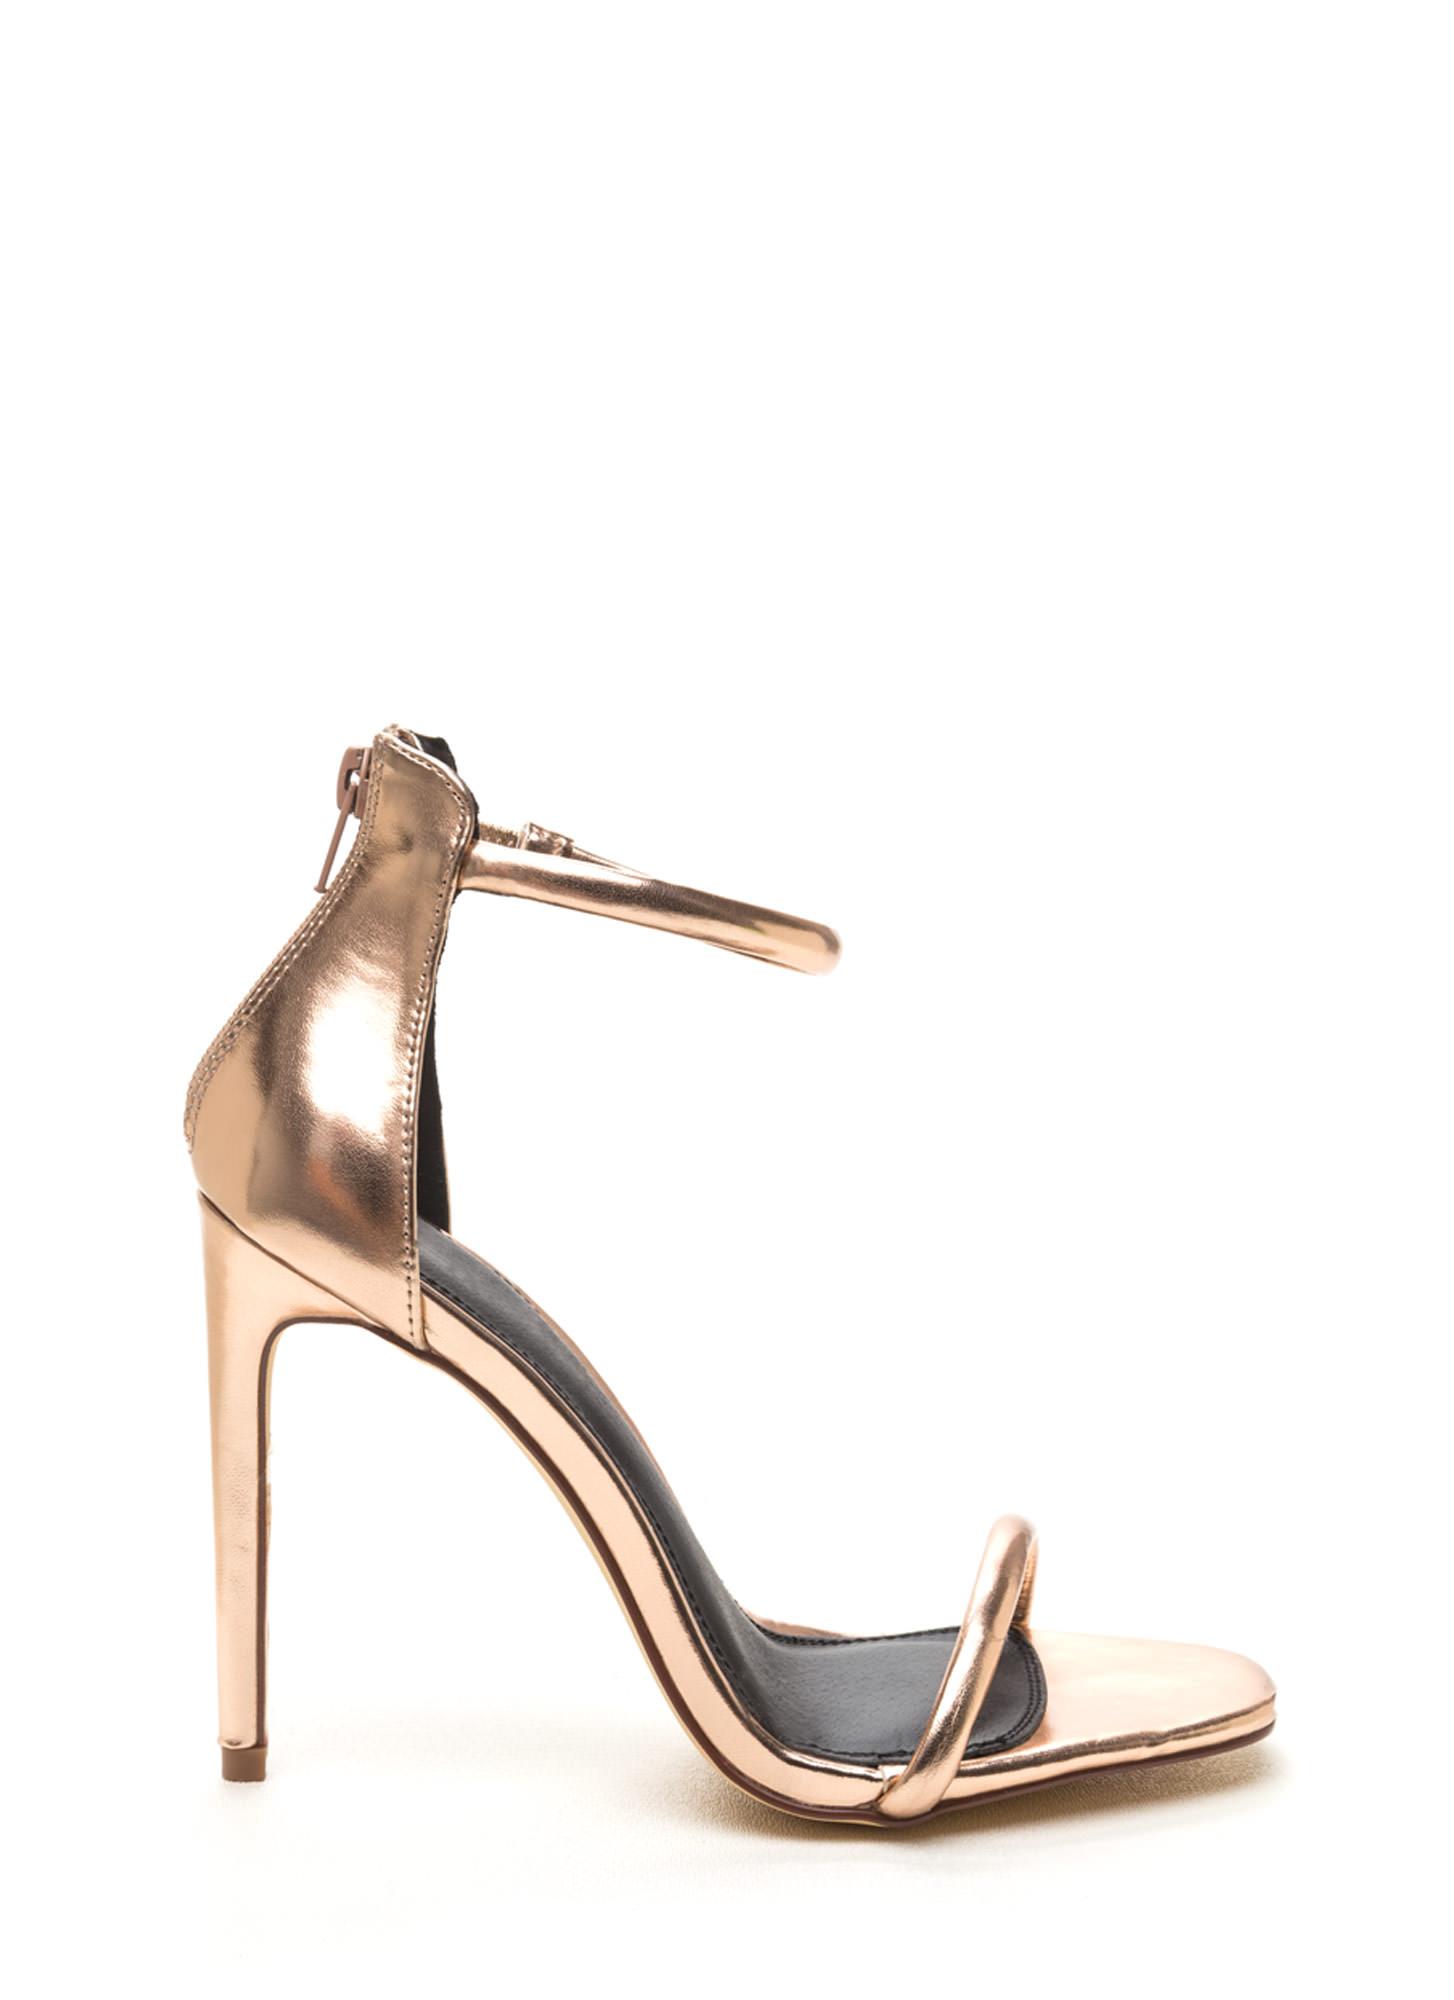 rose gold low heel wedding shoes photo - 1